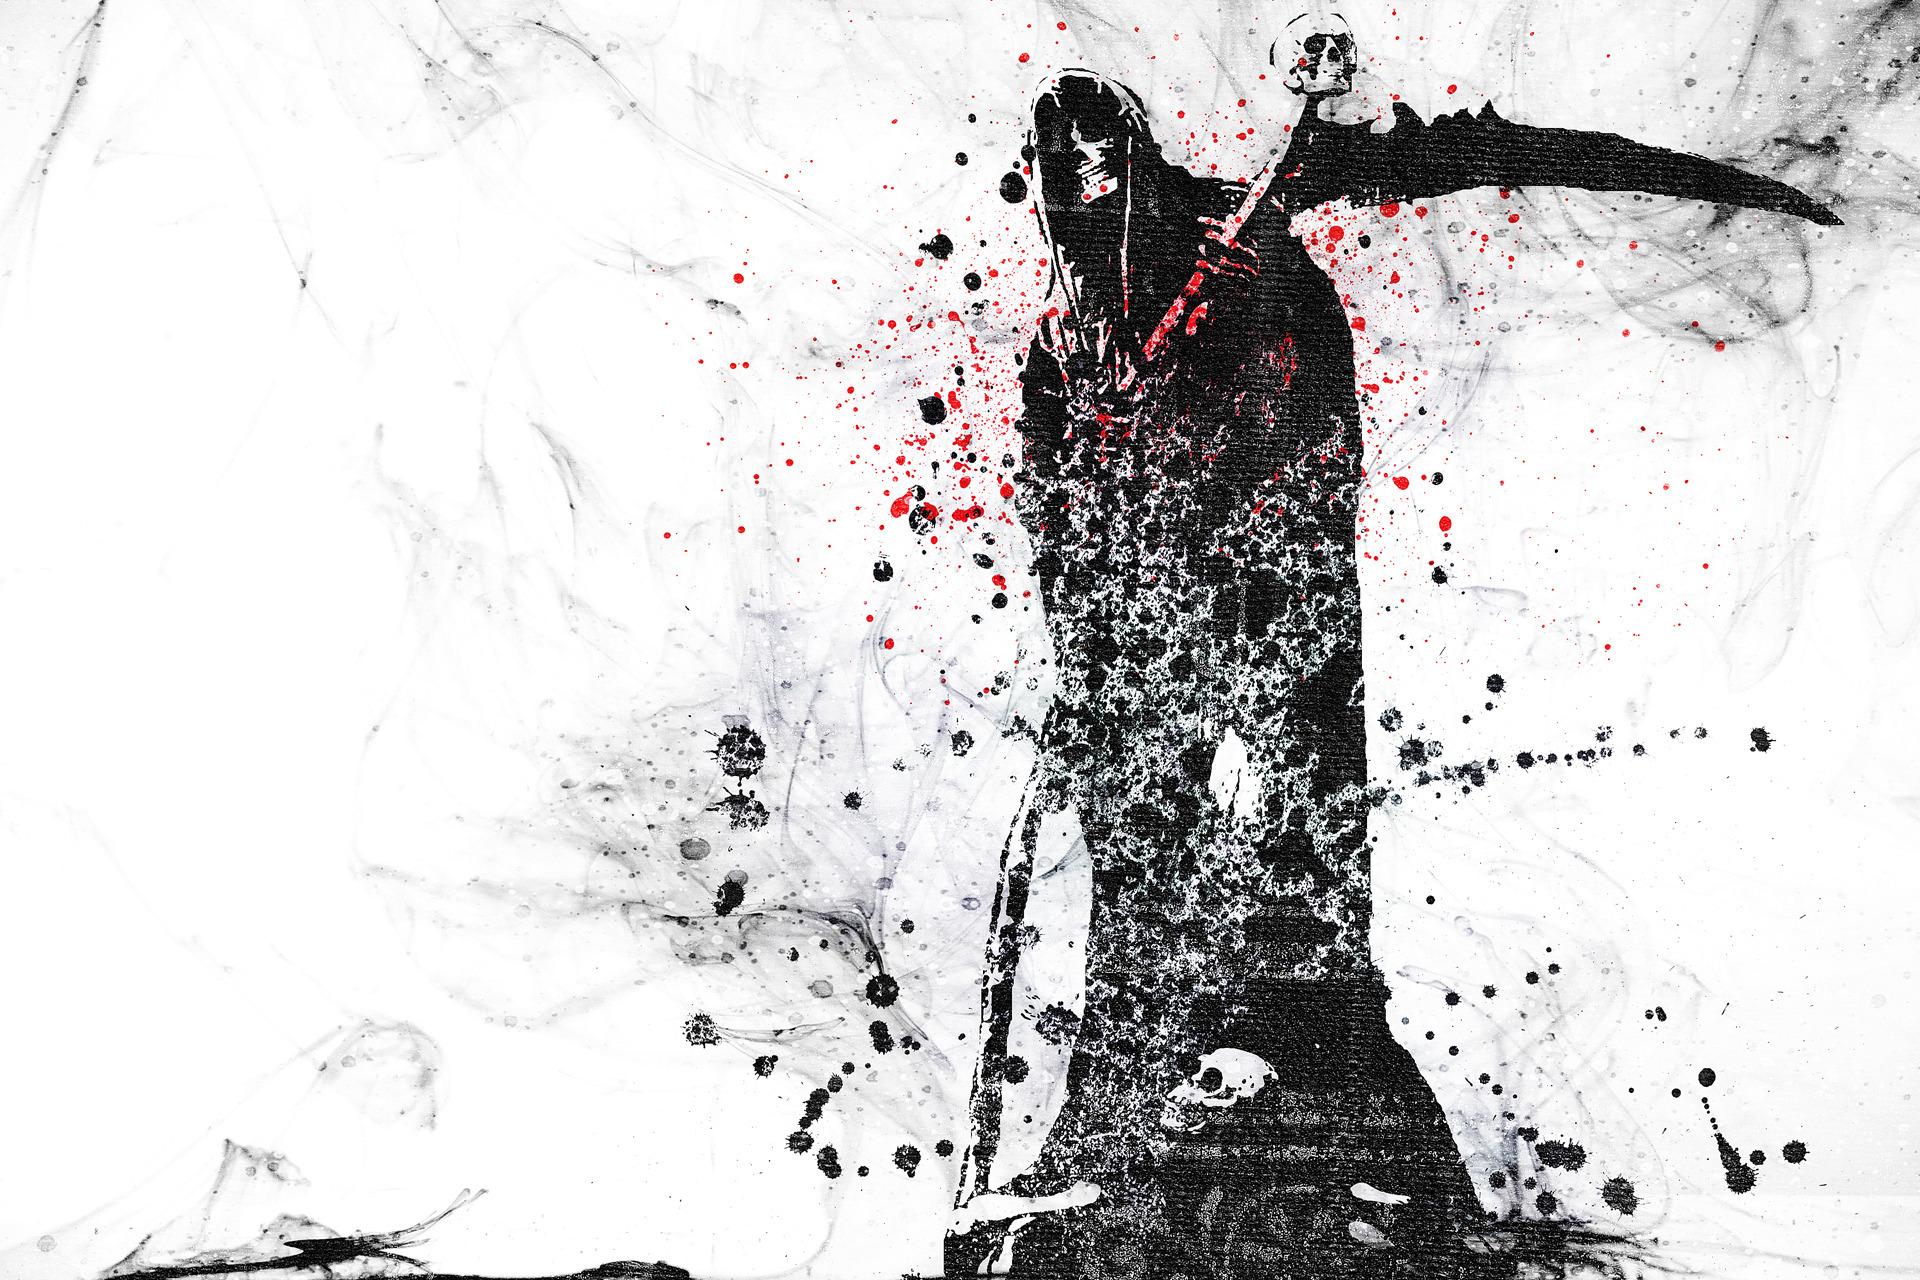 Dark Grim Reaper horror skeletons skull creepy n wallpaper 1920x1280 1920x1280